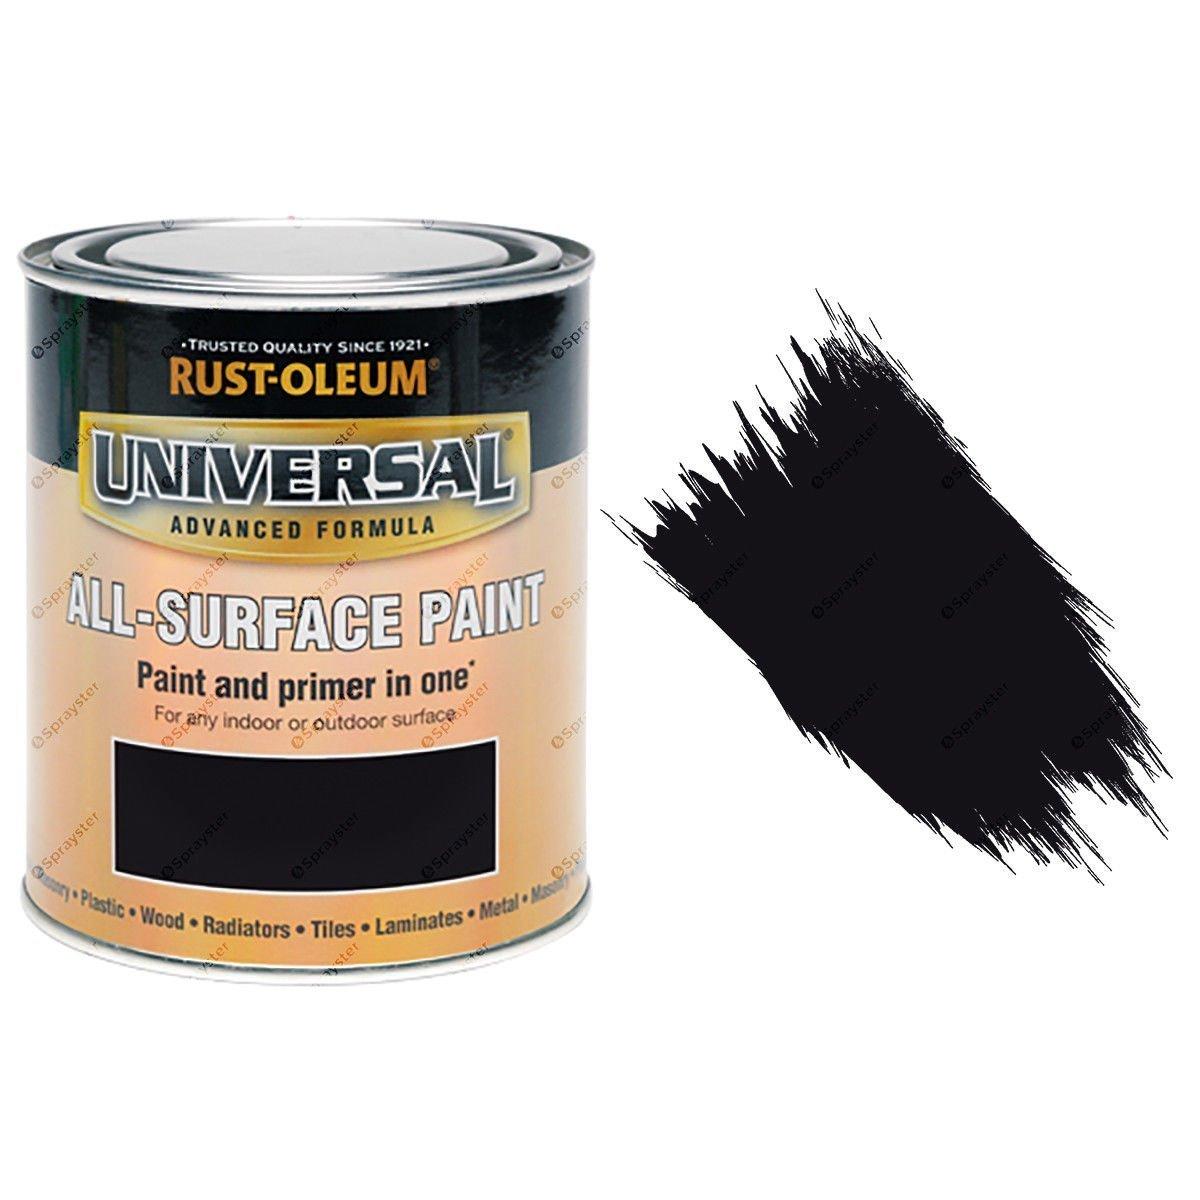 Rust-Oleum-Universal-All-Surface-Self-Primer-Brush-Paint-Gloss-Black-750ml-372229316271